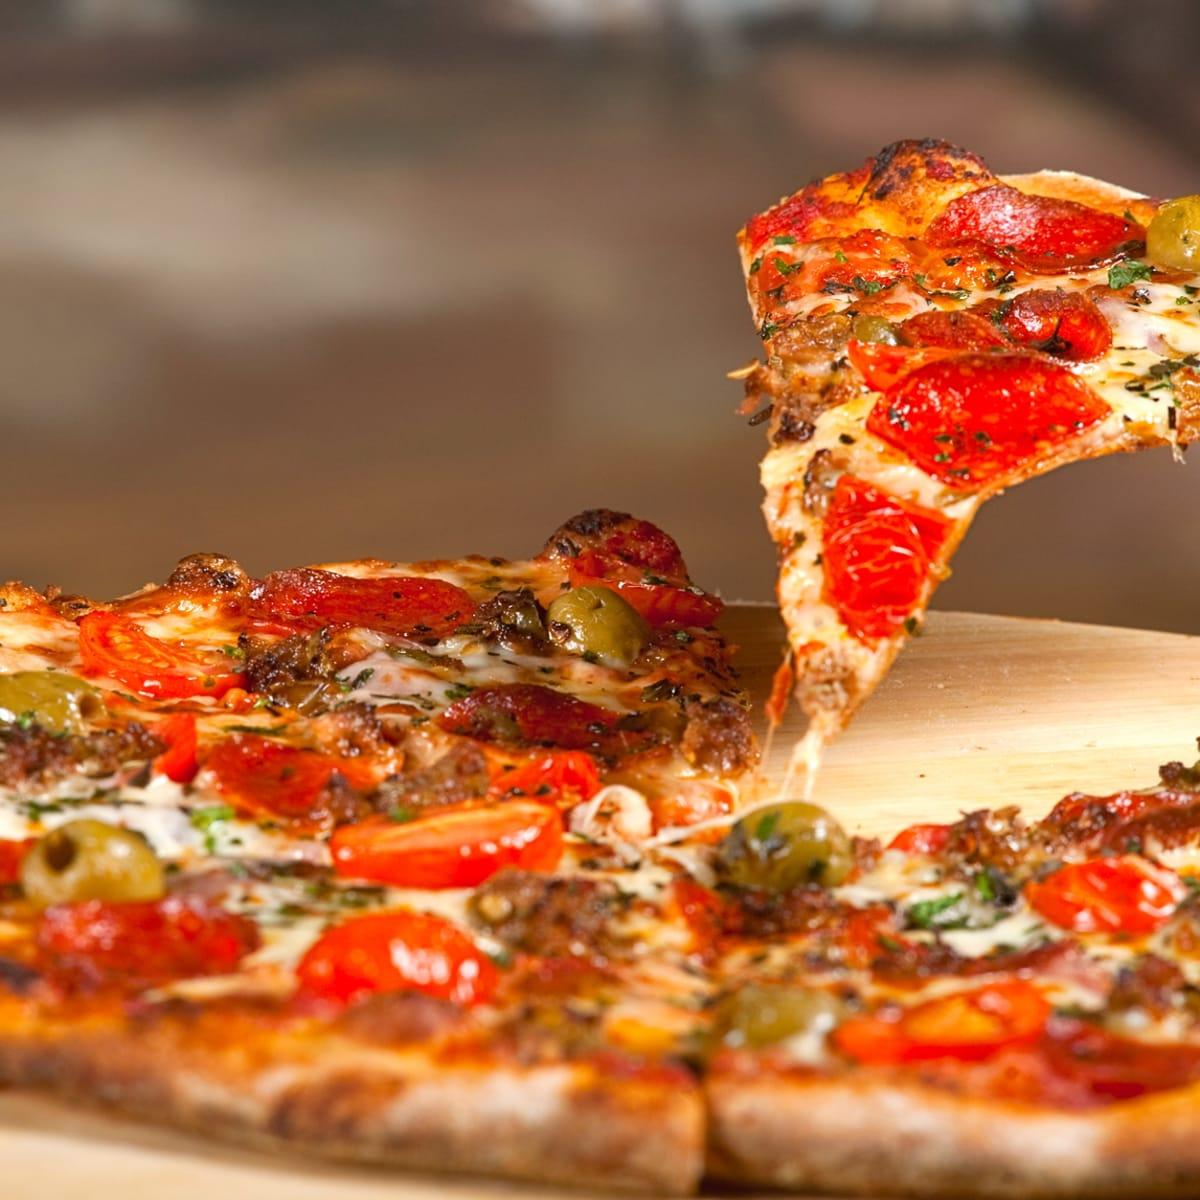 Houston, Crisp Woodlands, pizza, June 2015